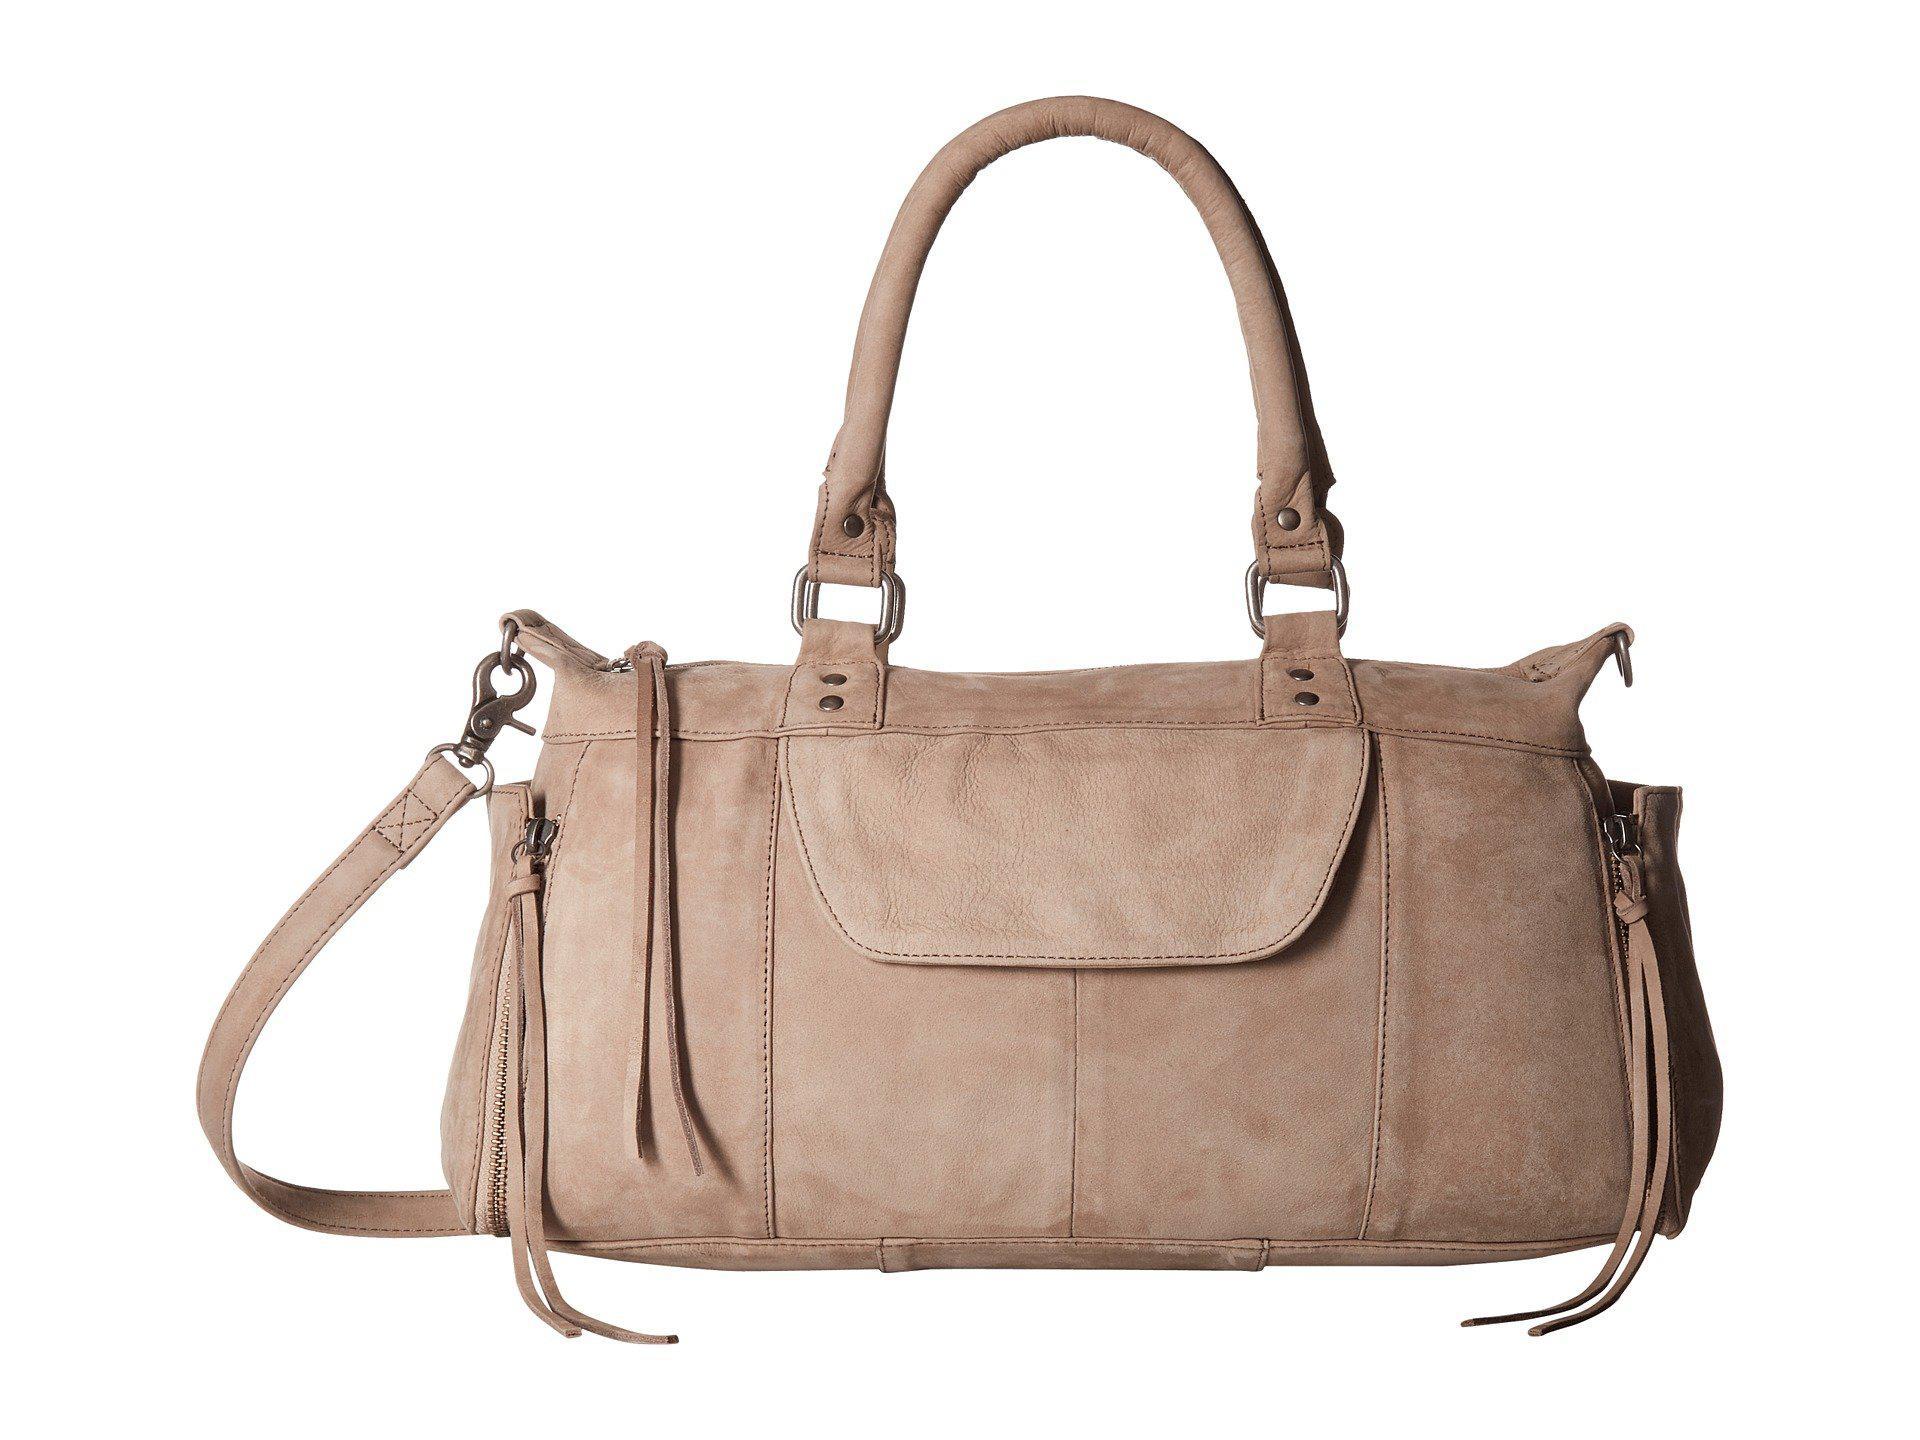 Day & Mood Mynthe Satchel (Black) Satchel Handbags uOoQPbFTSY